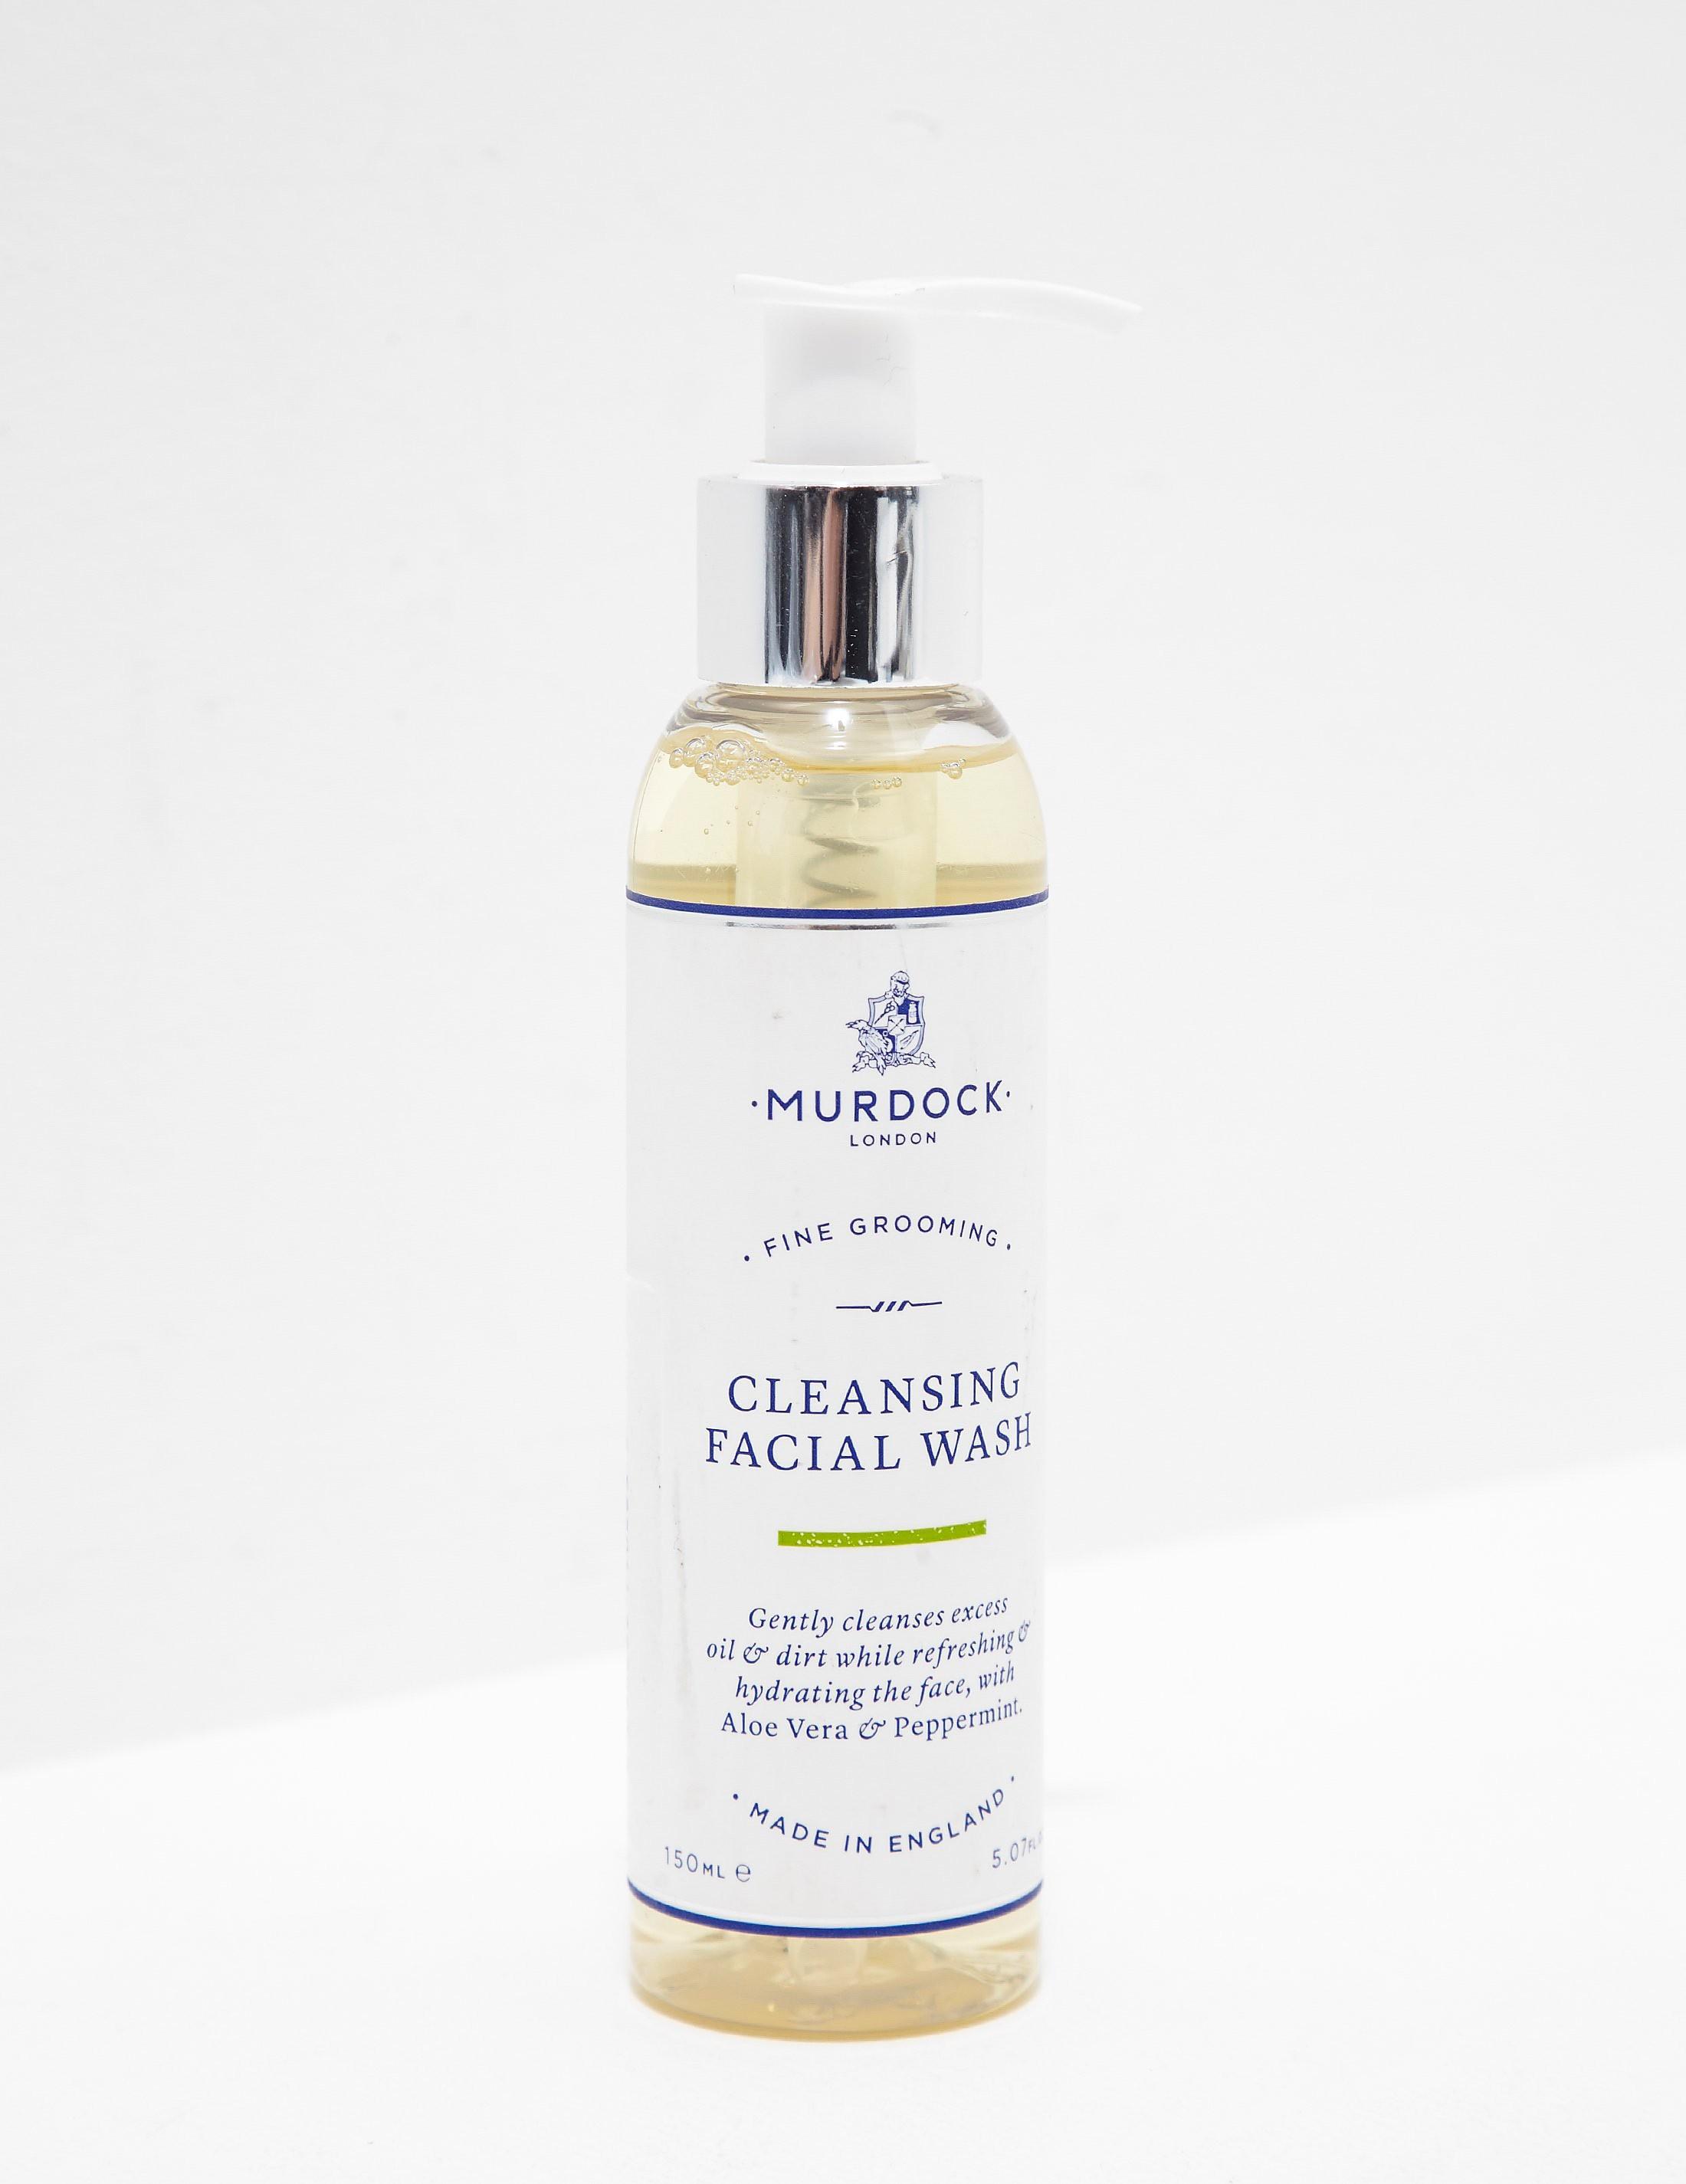 Murdock London Cleansing Facial Wash